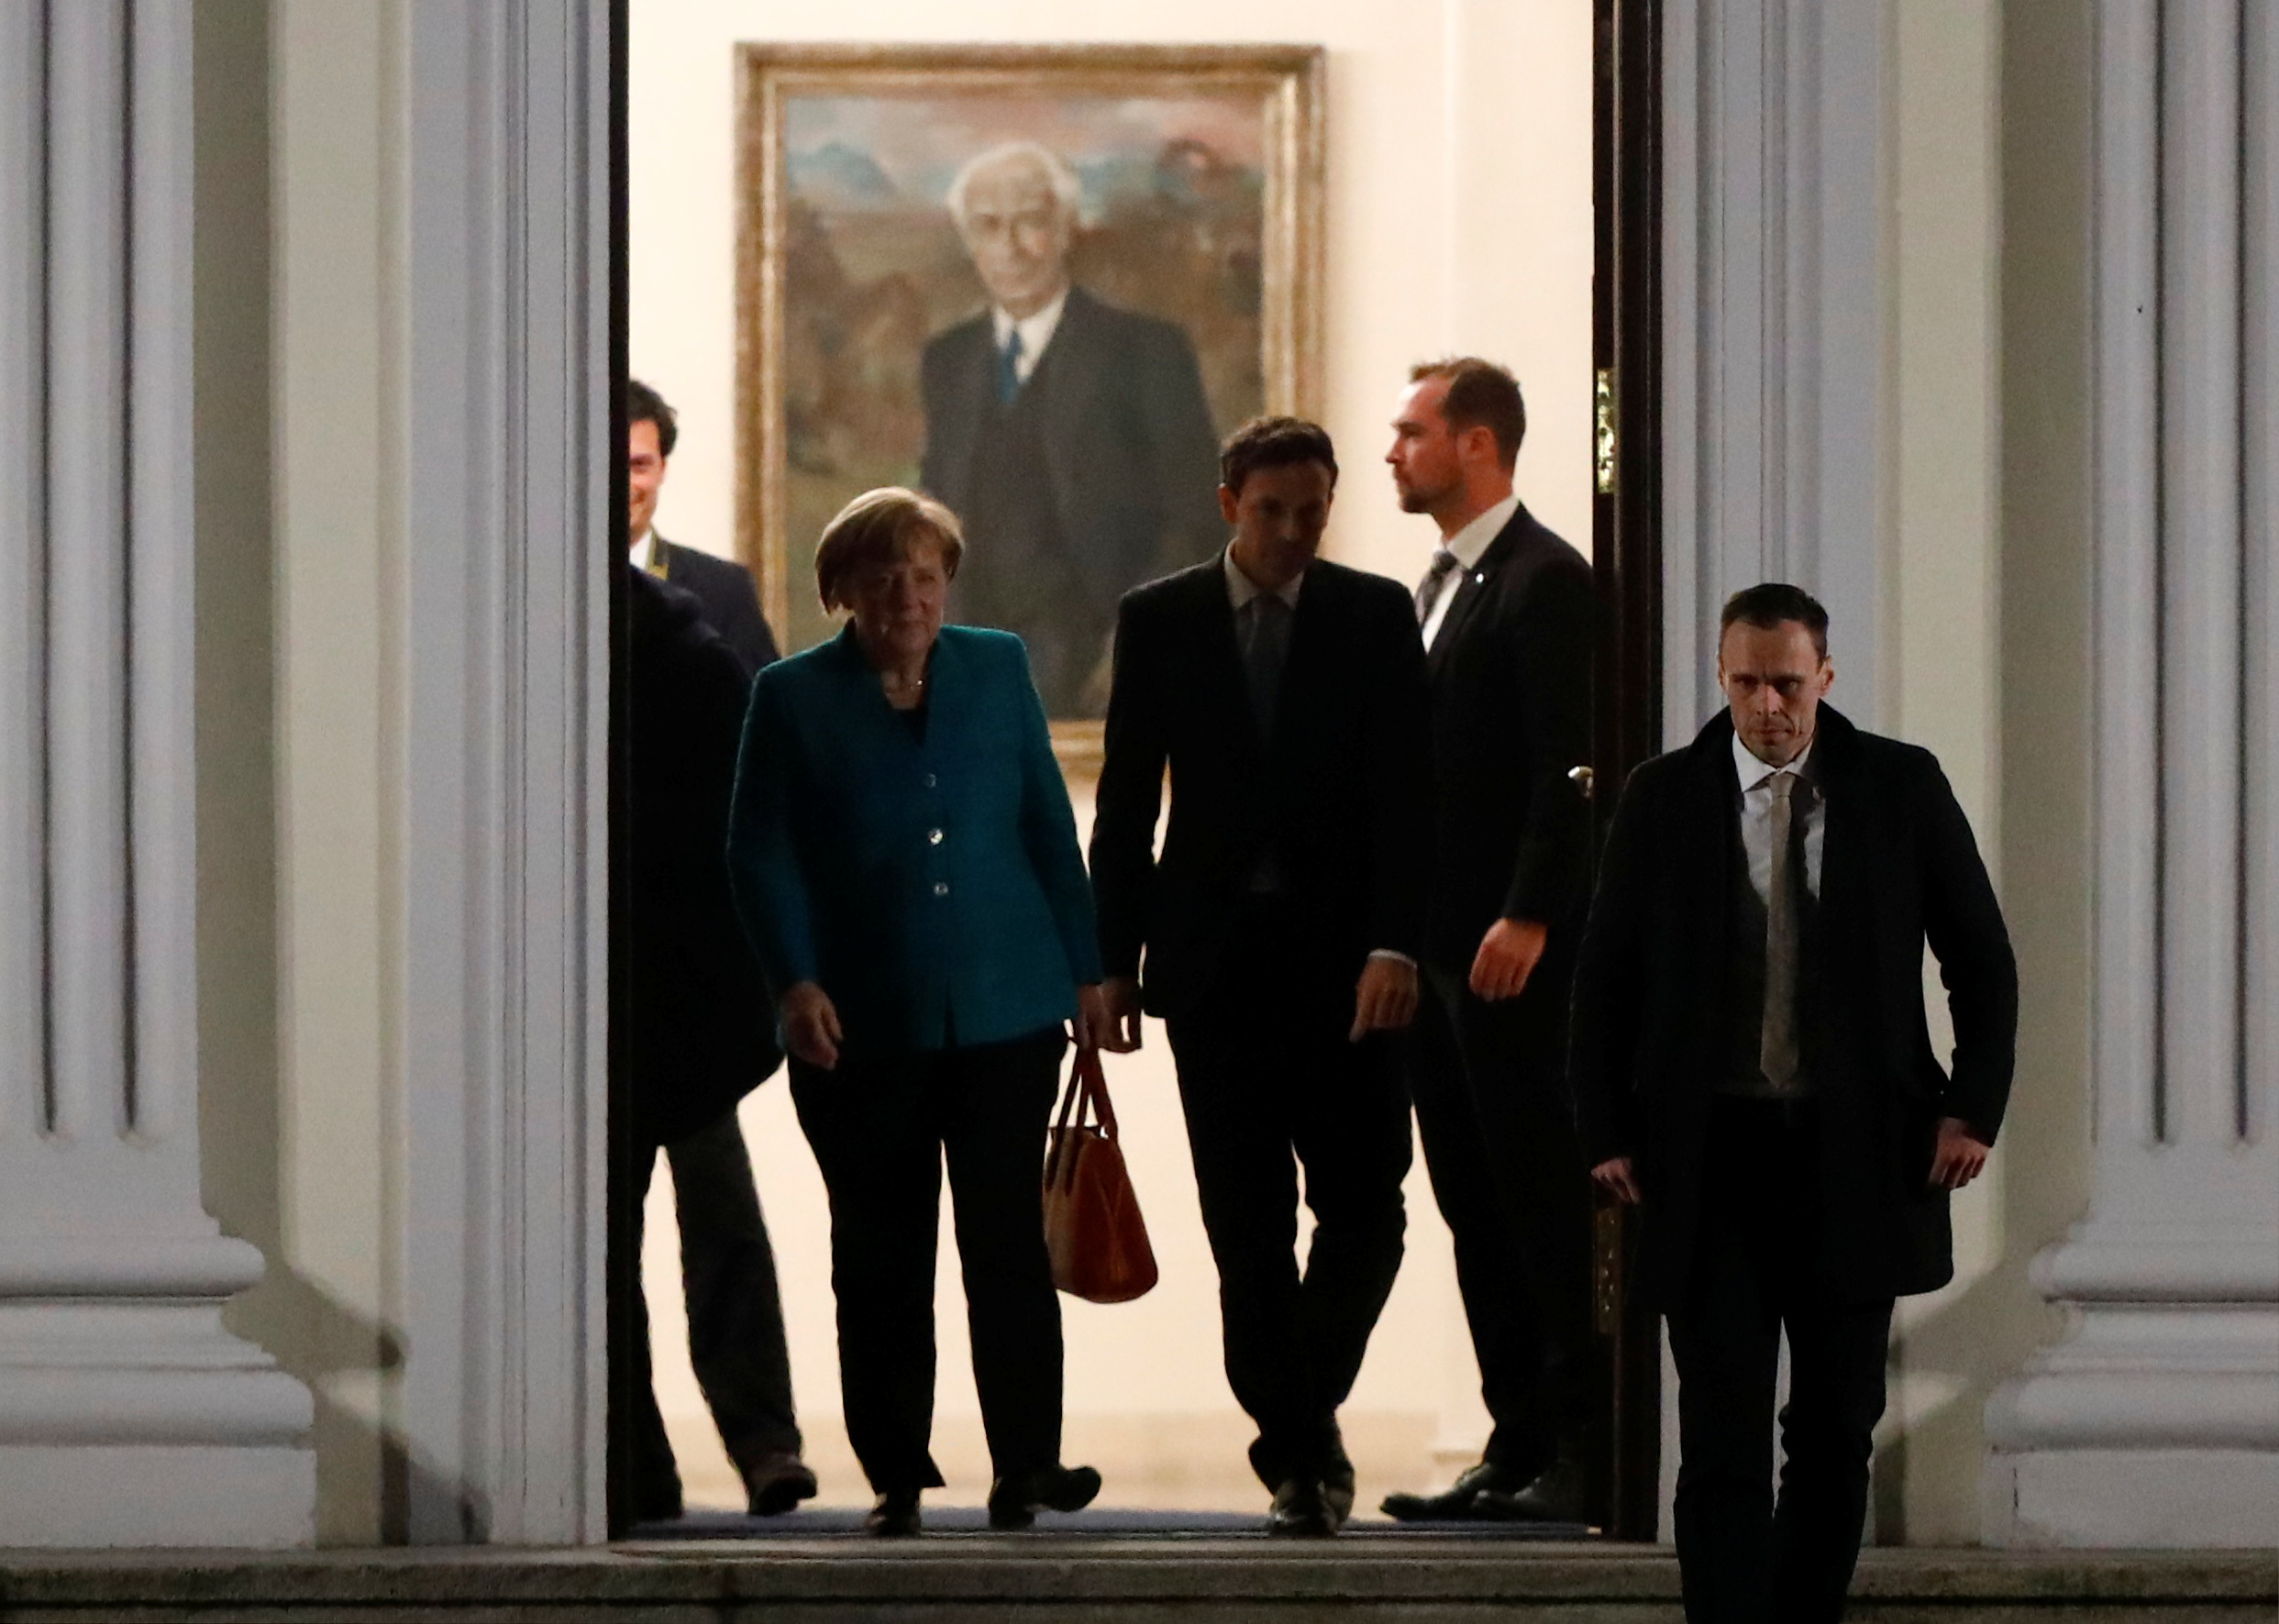 2017 11 30T213908Z 483794296 RC17E2D140F0 RTRMADP 3 GERMANY POLITICS